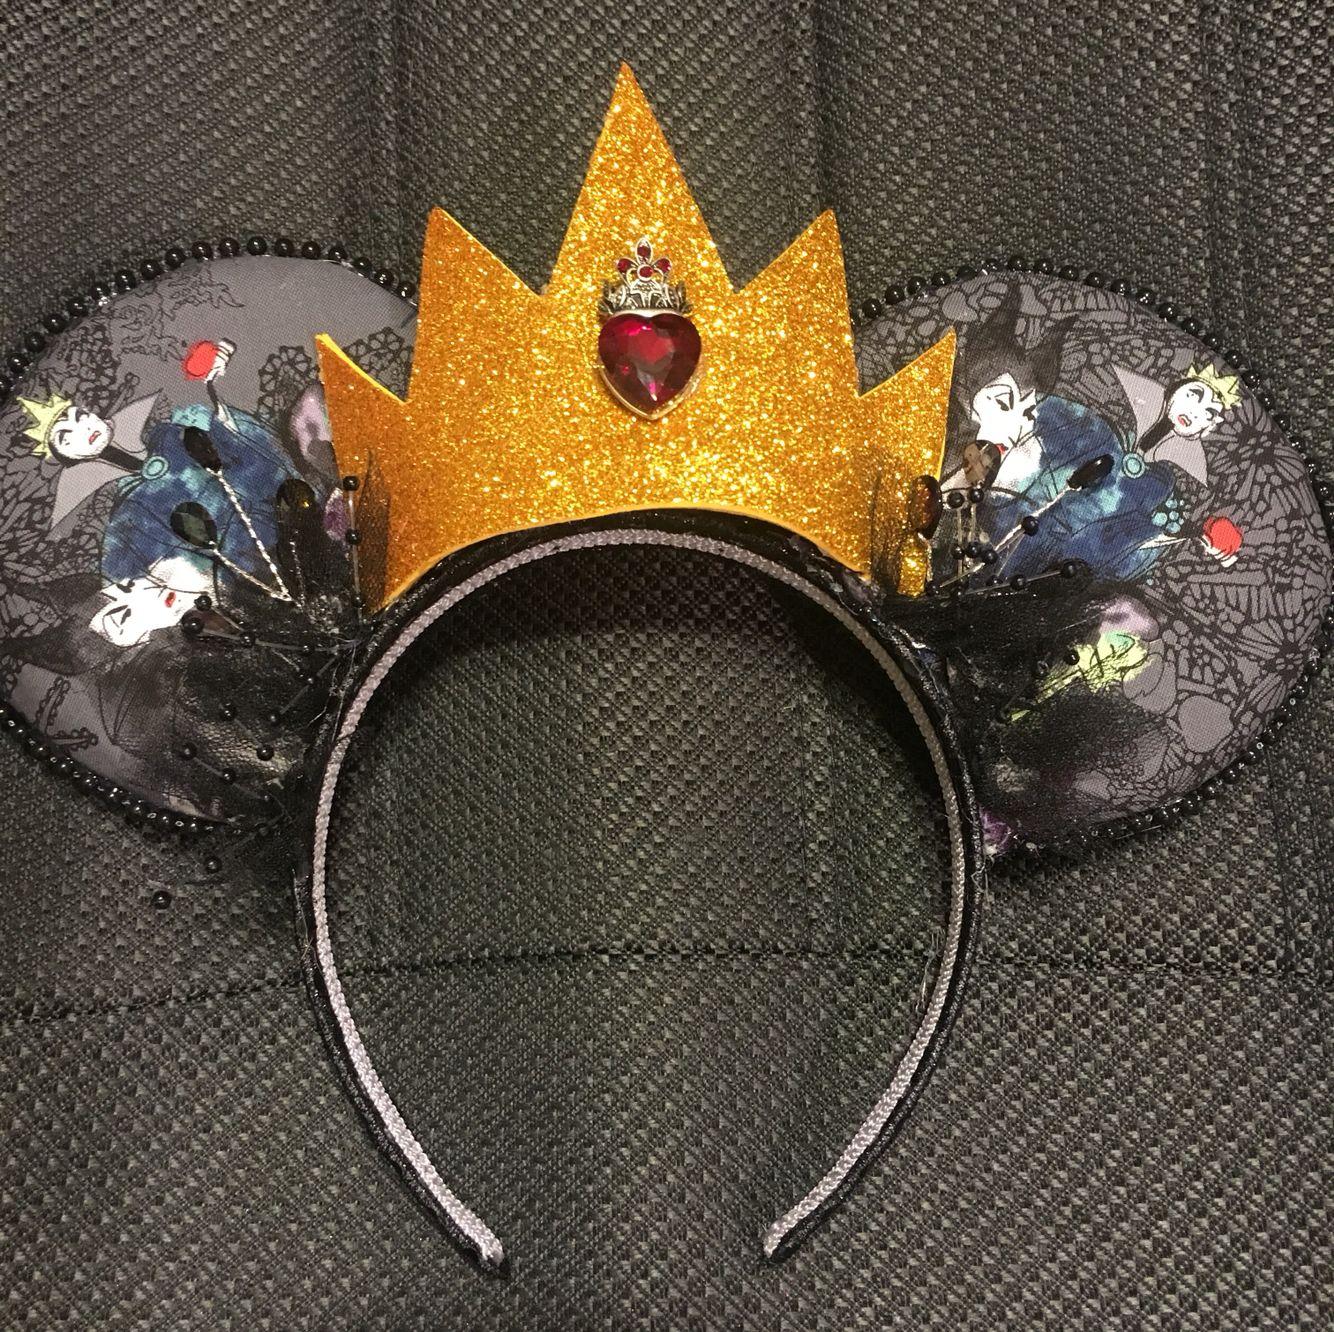 Evil Queen and Villains Mouse Ears   Disney ears headband ...Disney Evil Queen Ears